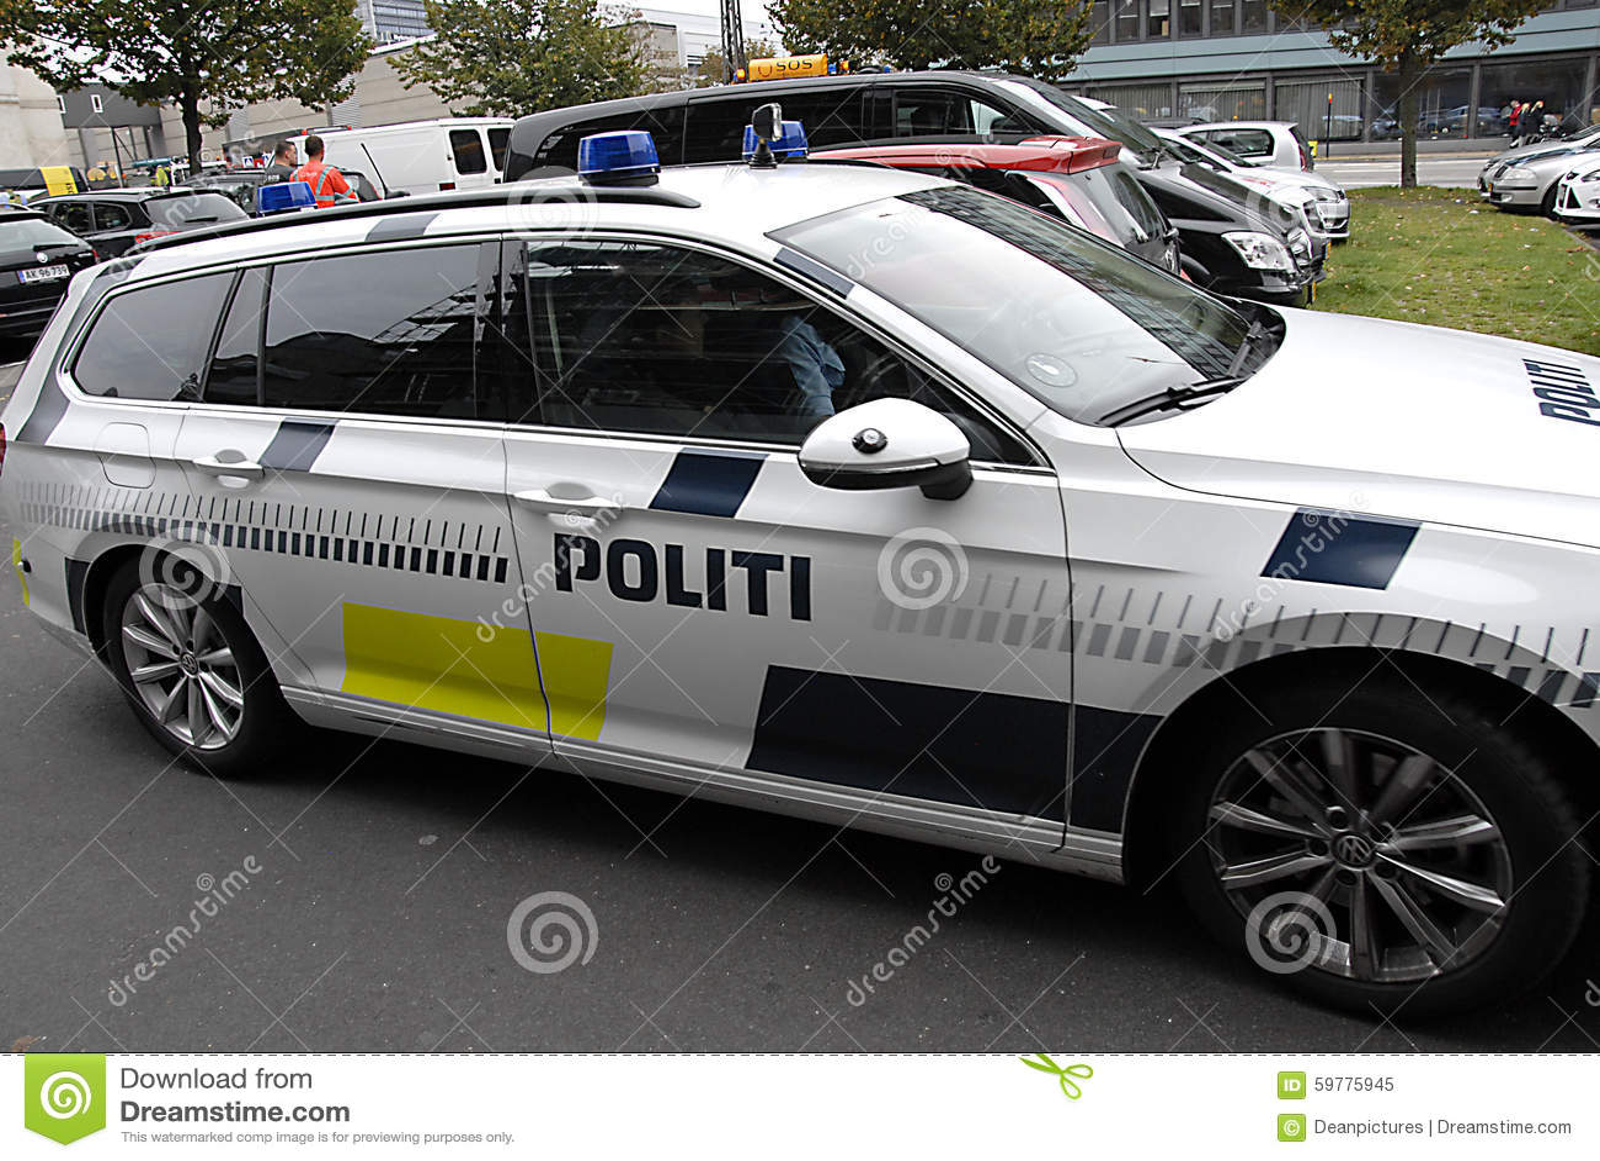 Denmark Cars Prices